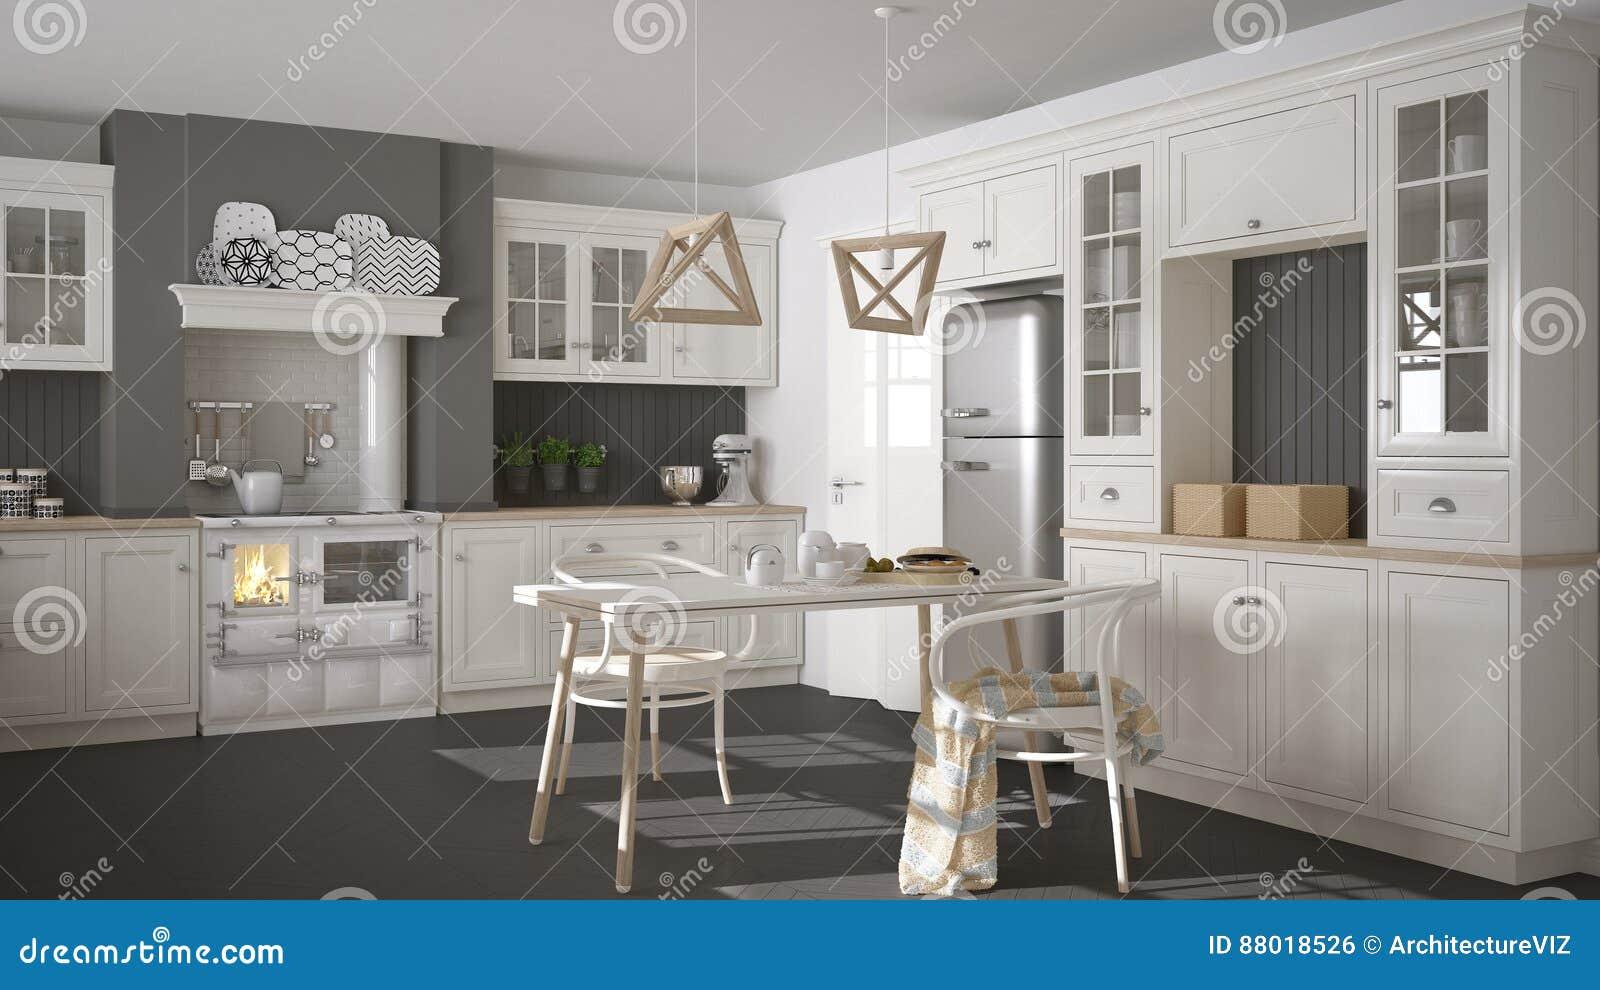 Cucina Bianca Classica Scandinava Con I Dettagli Di Legno ...